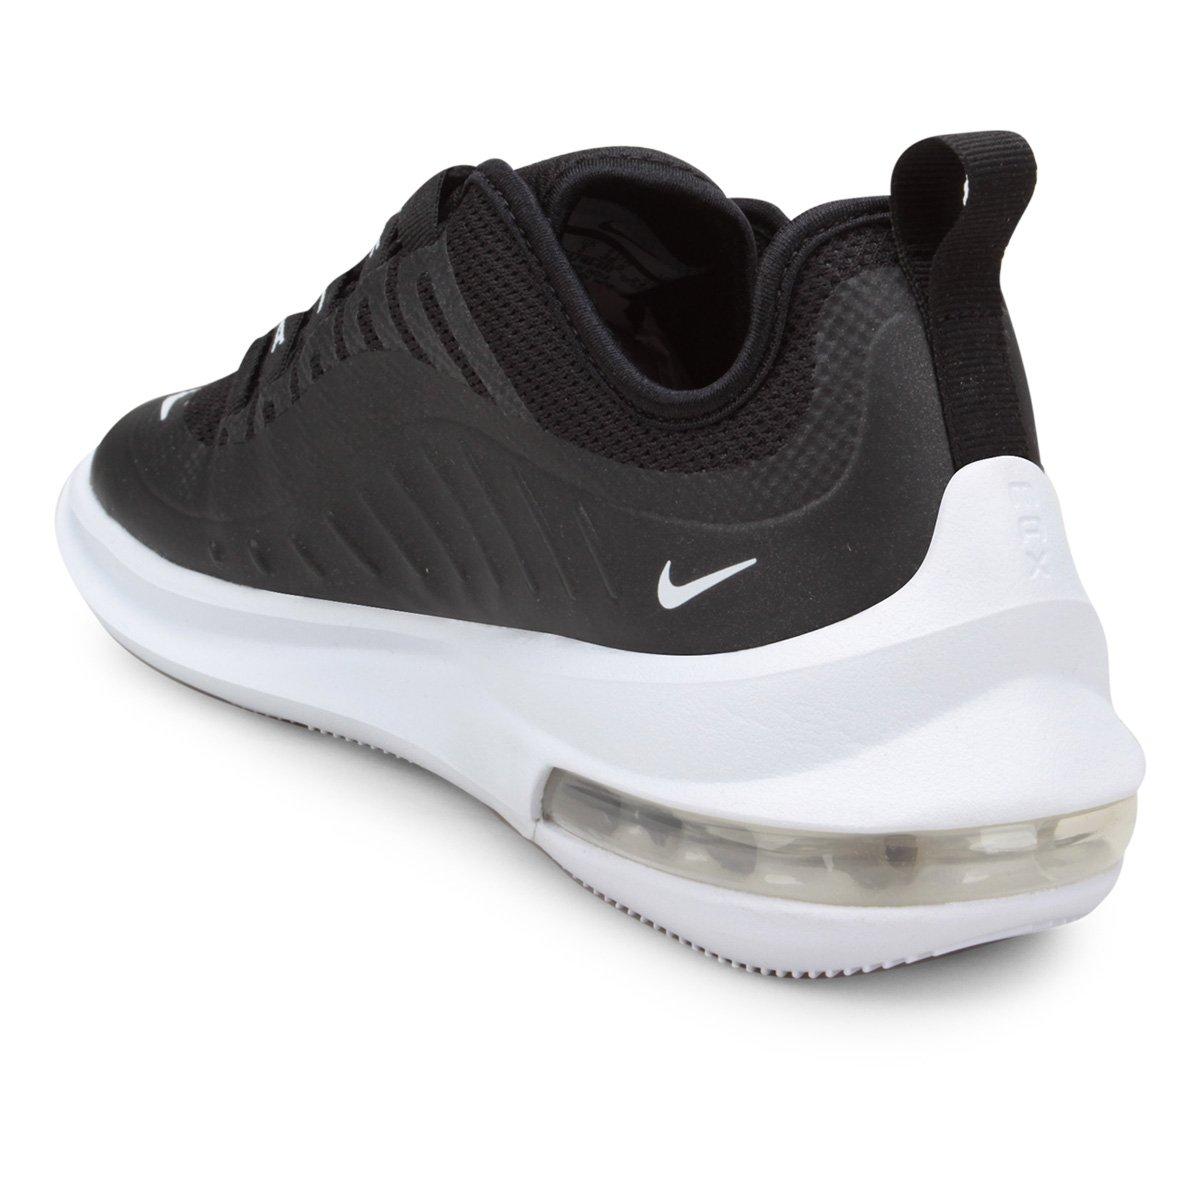 Tênis Nike Air Max Axis - Branco e Preto - Compre Agora  40889f4662974